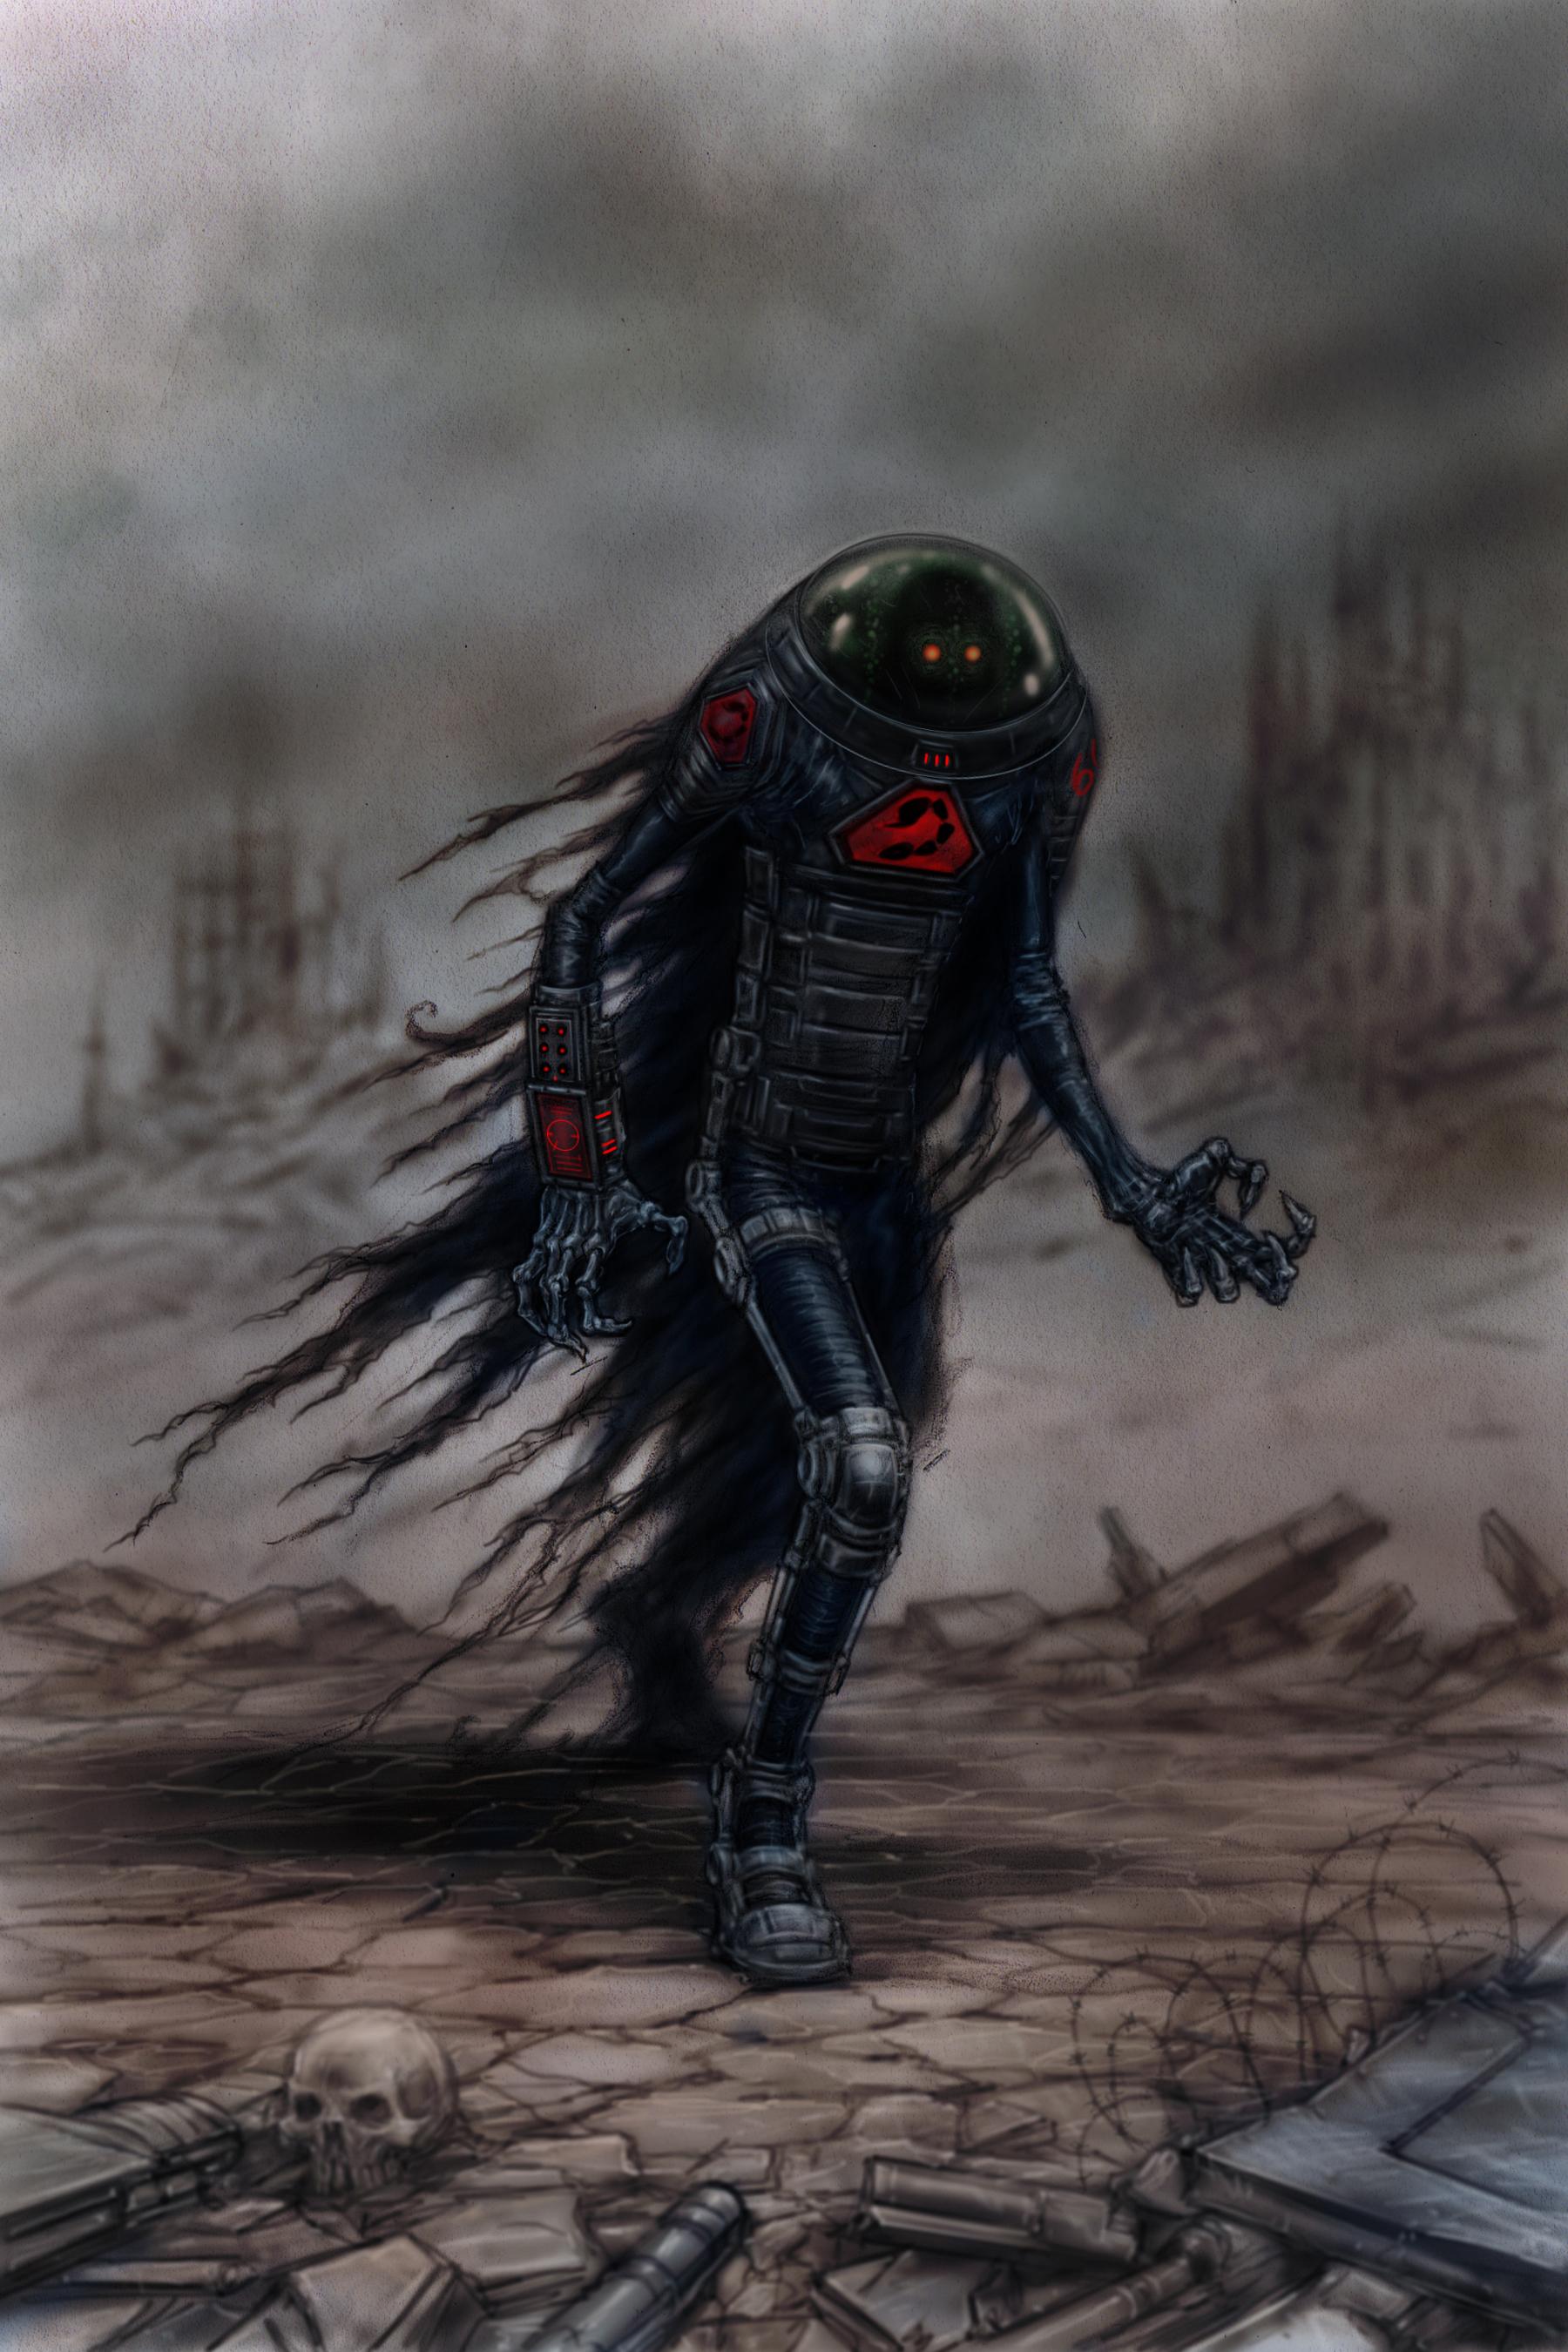 Saboteur 2047